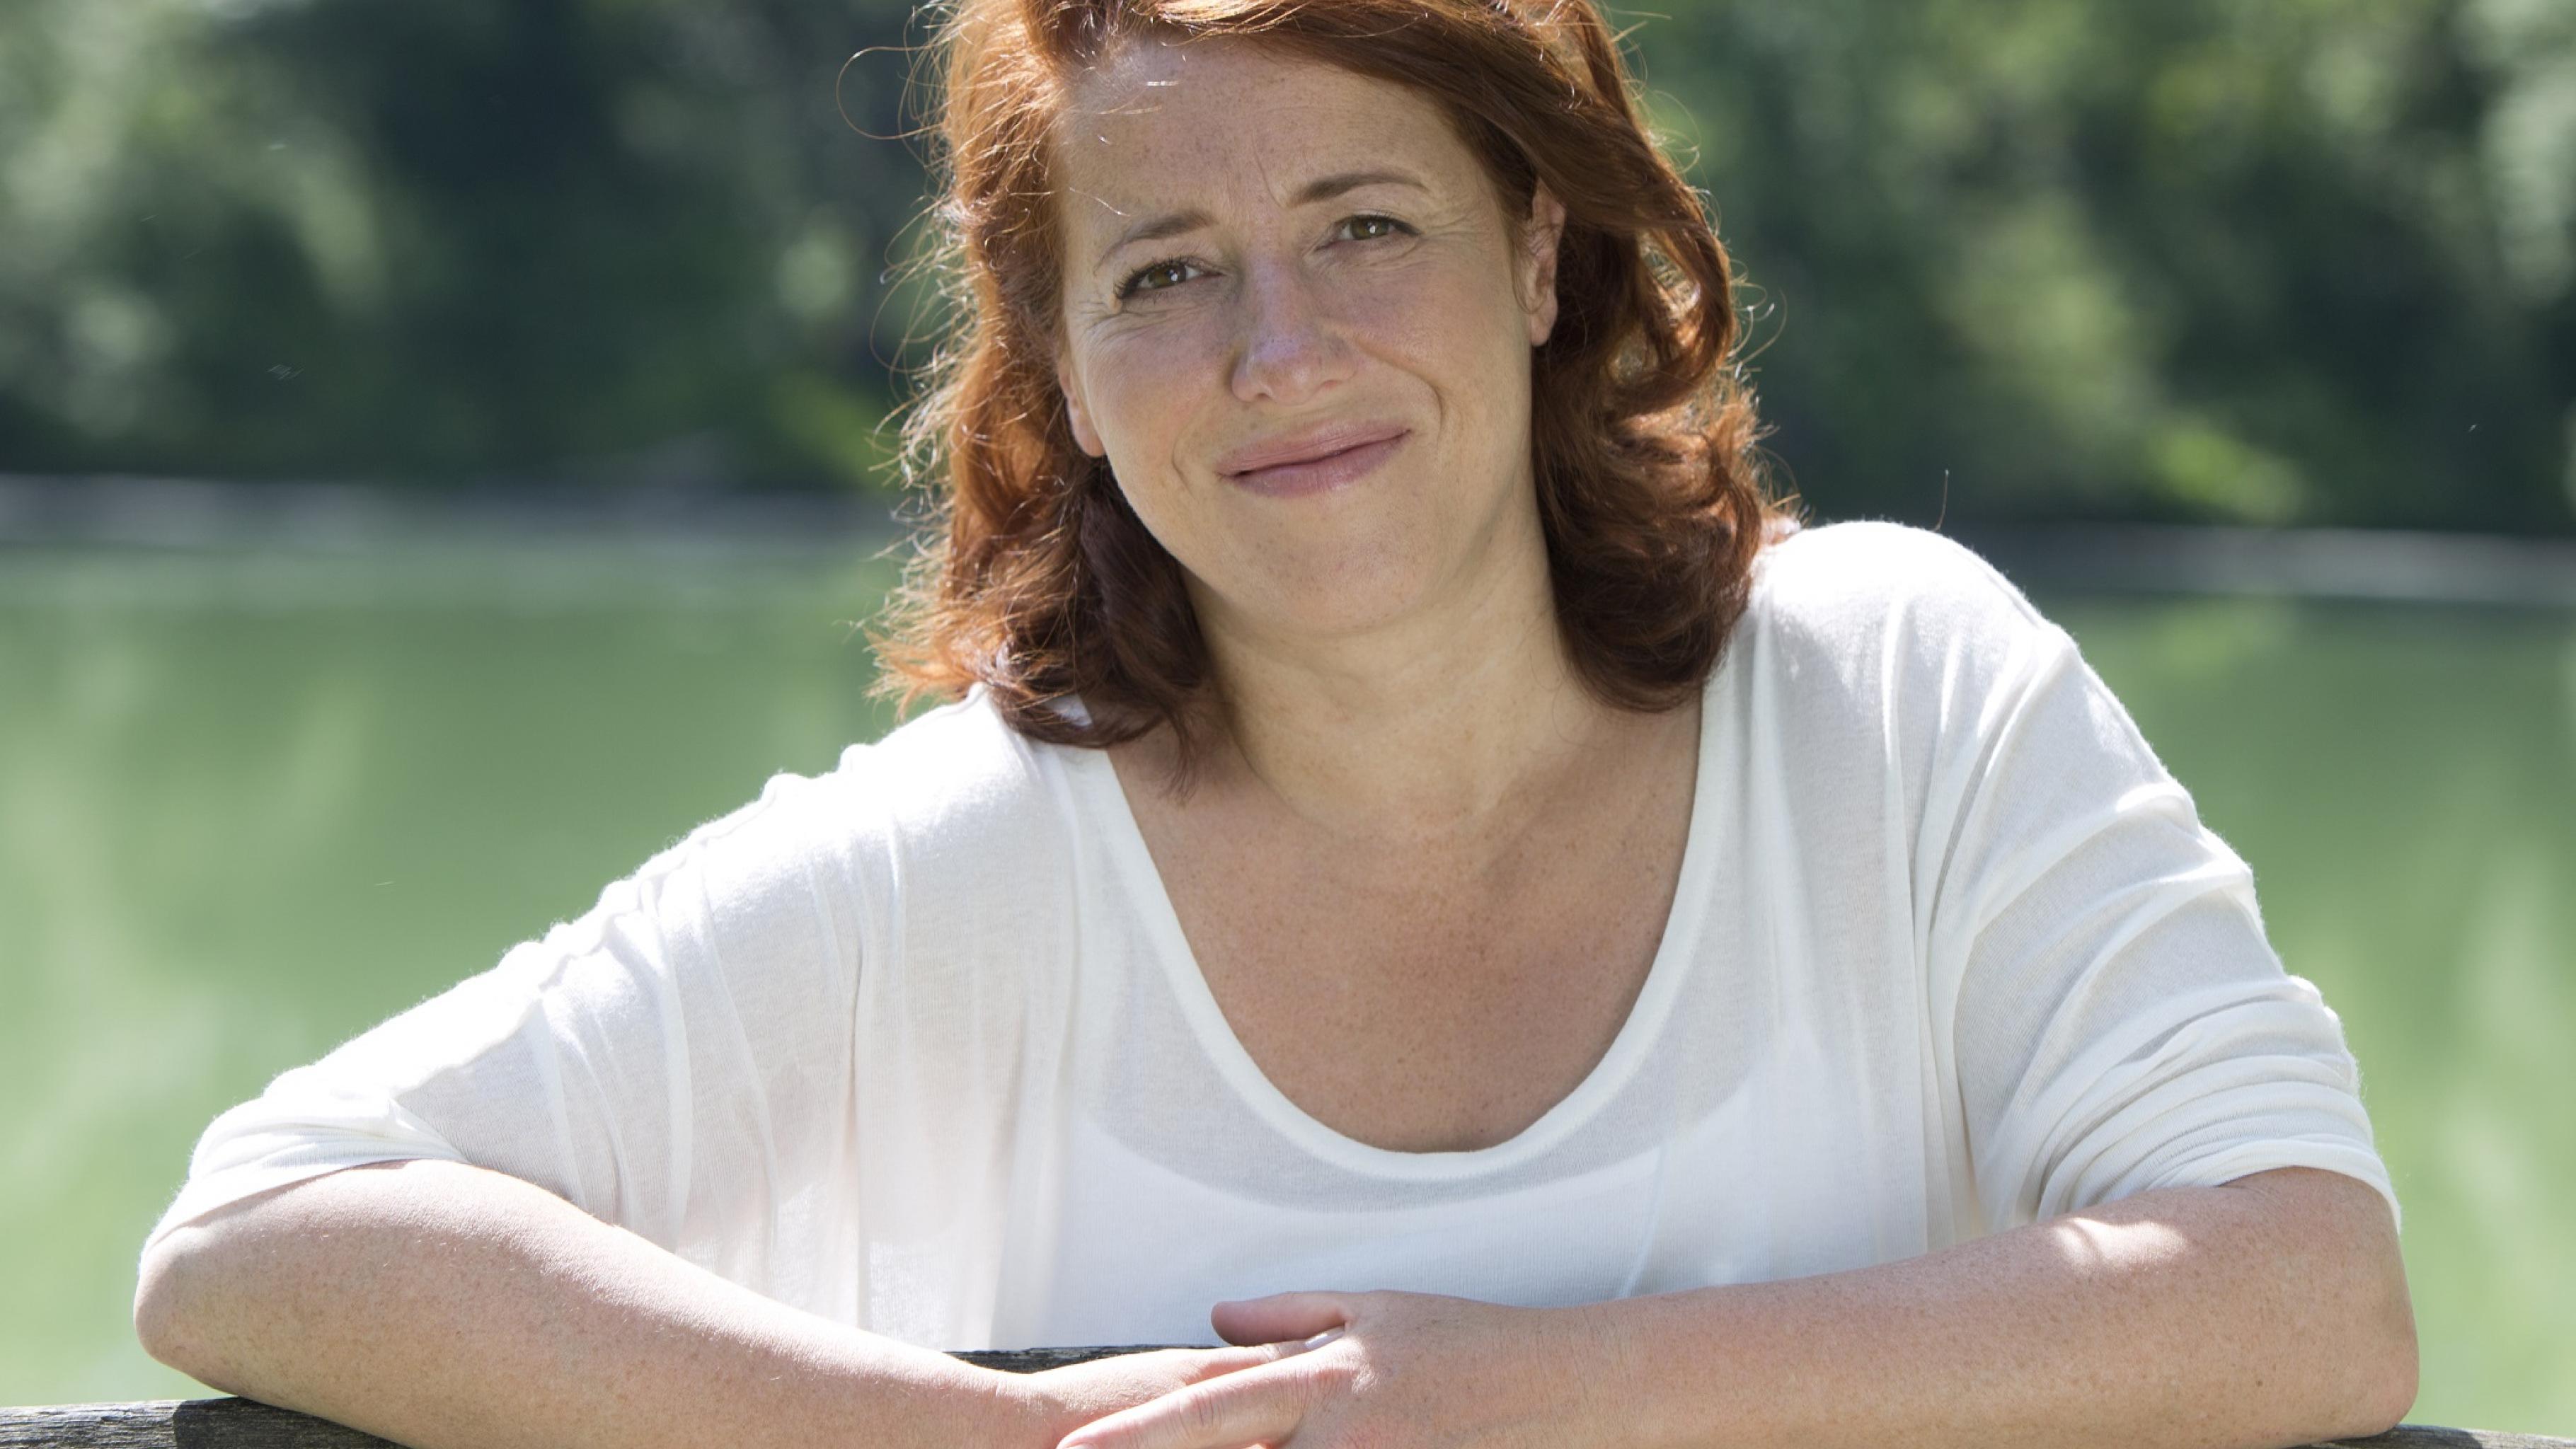 Kabarettistin und Oxfam Shop-Kundin Luise Kinseher